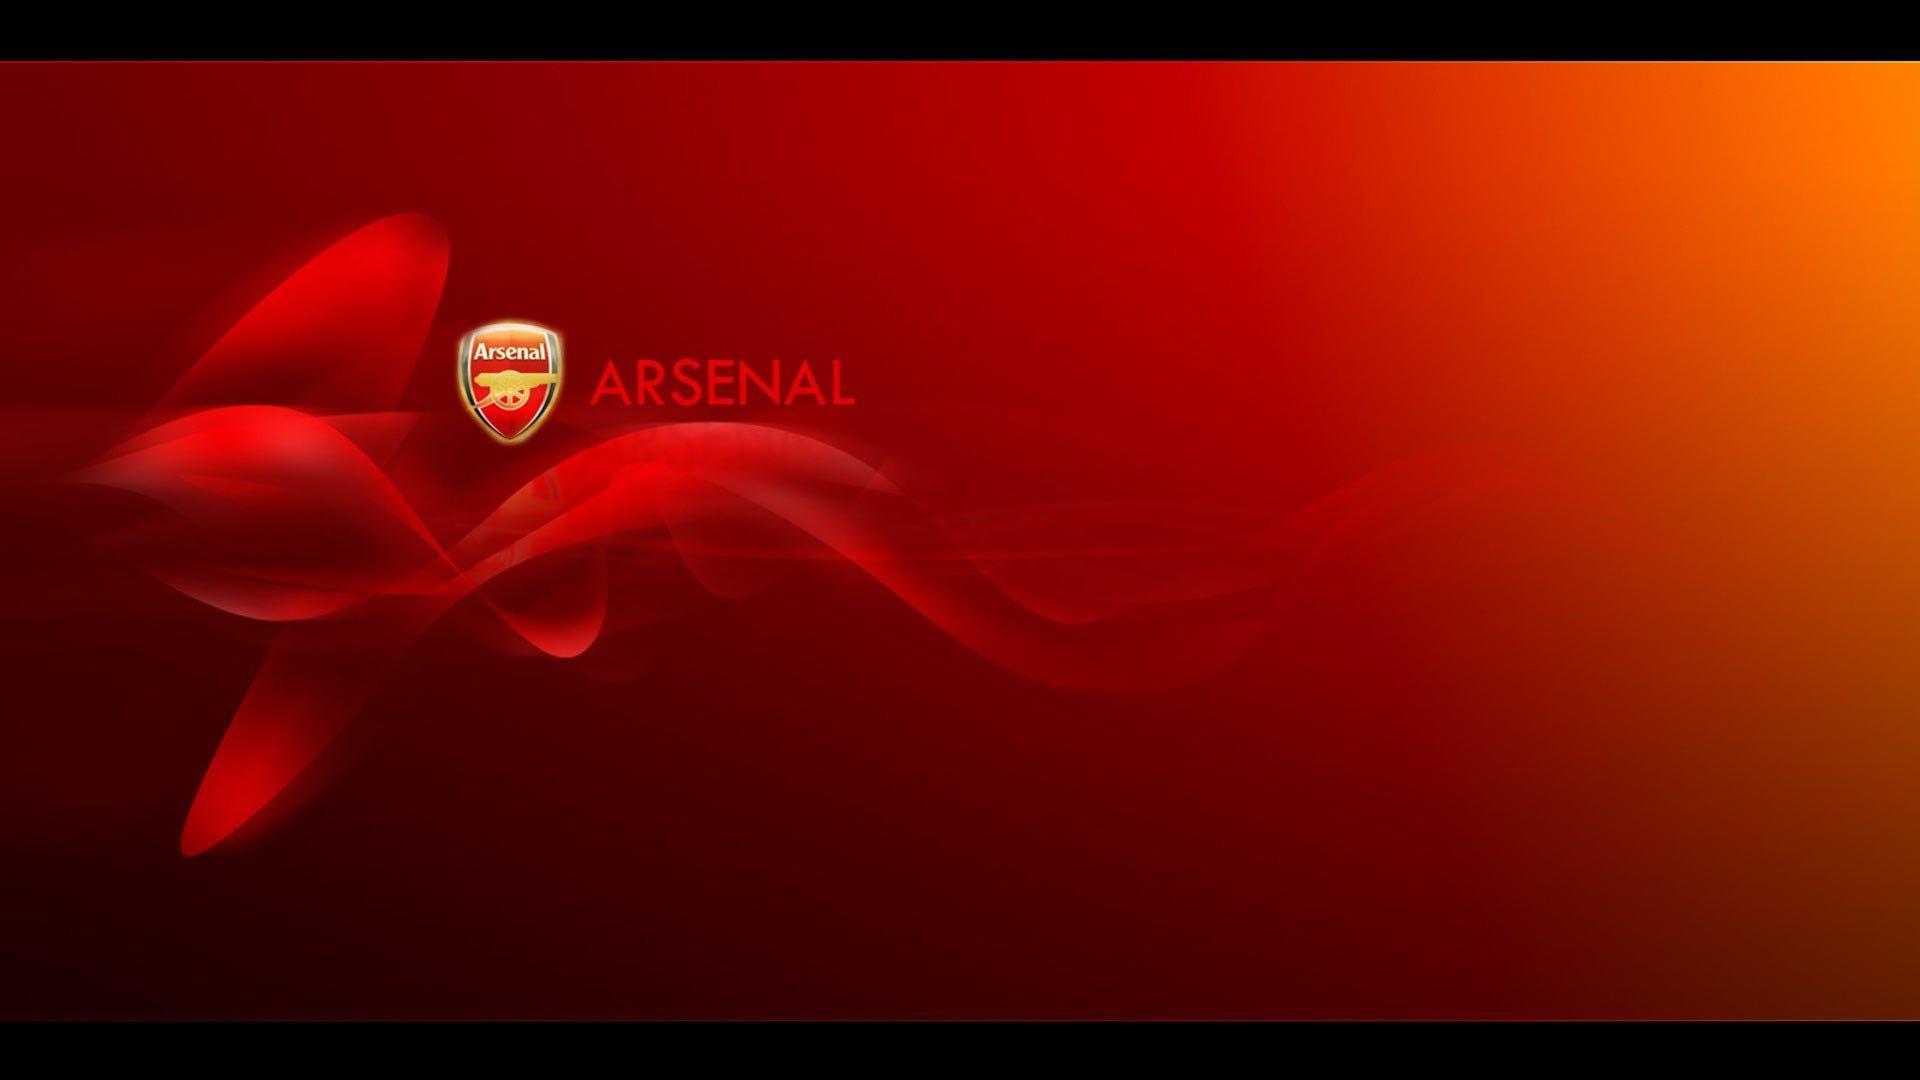 Arsenal Fc 1080p High Quality 1920x1080 Arsenal Fc Arsenal